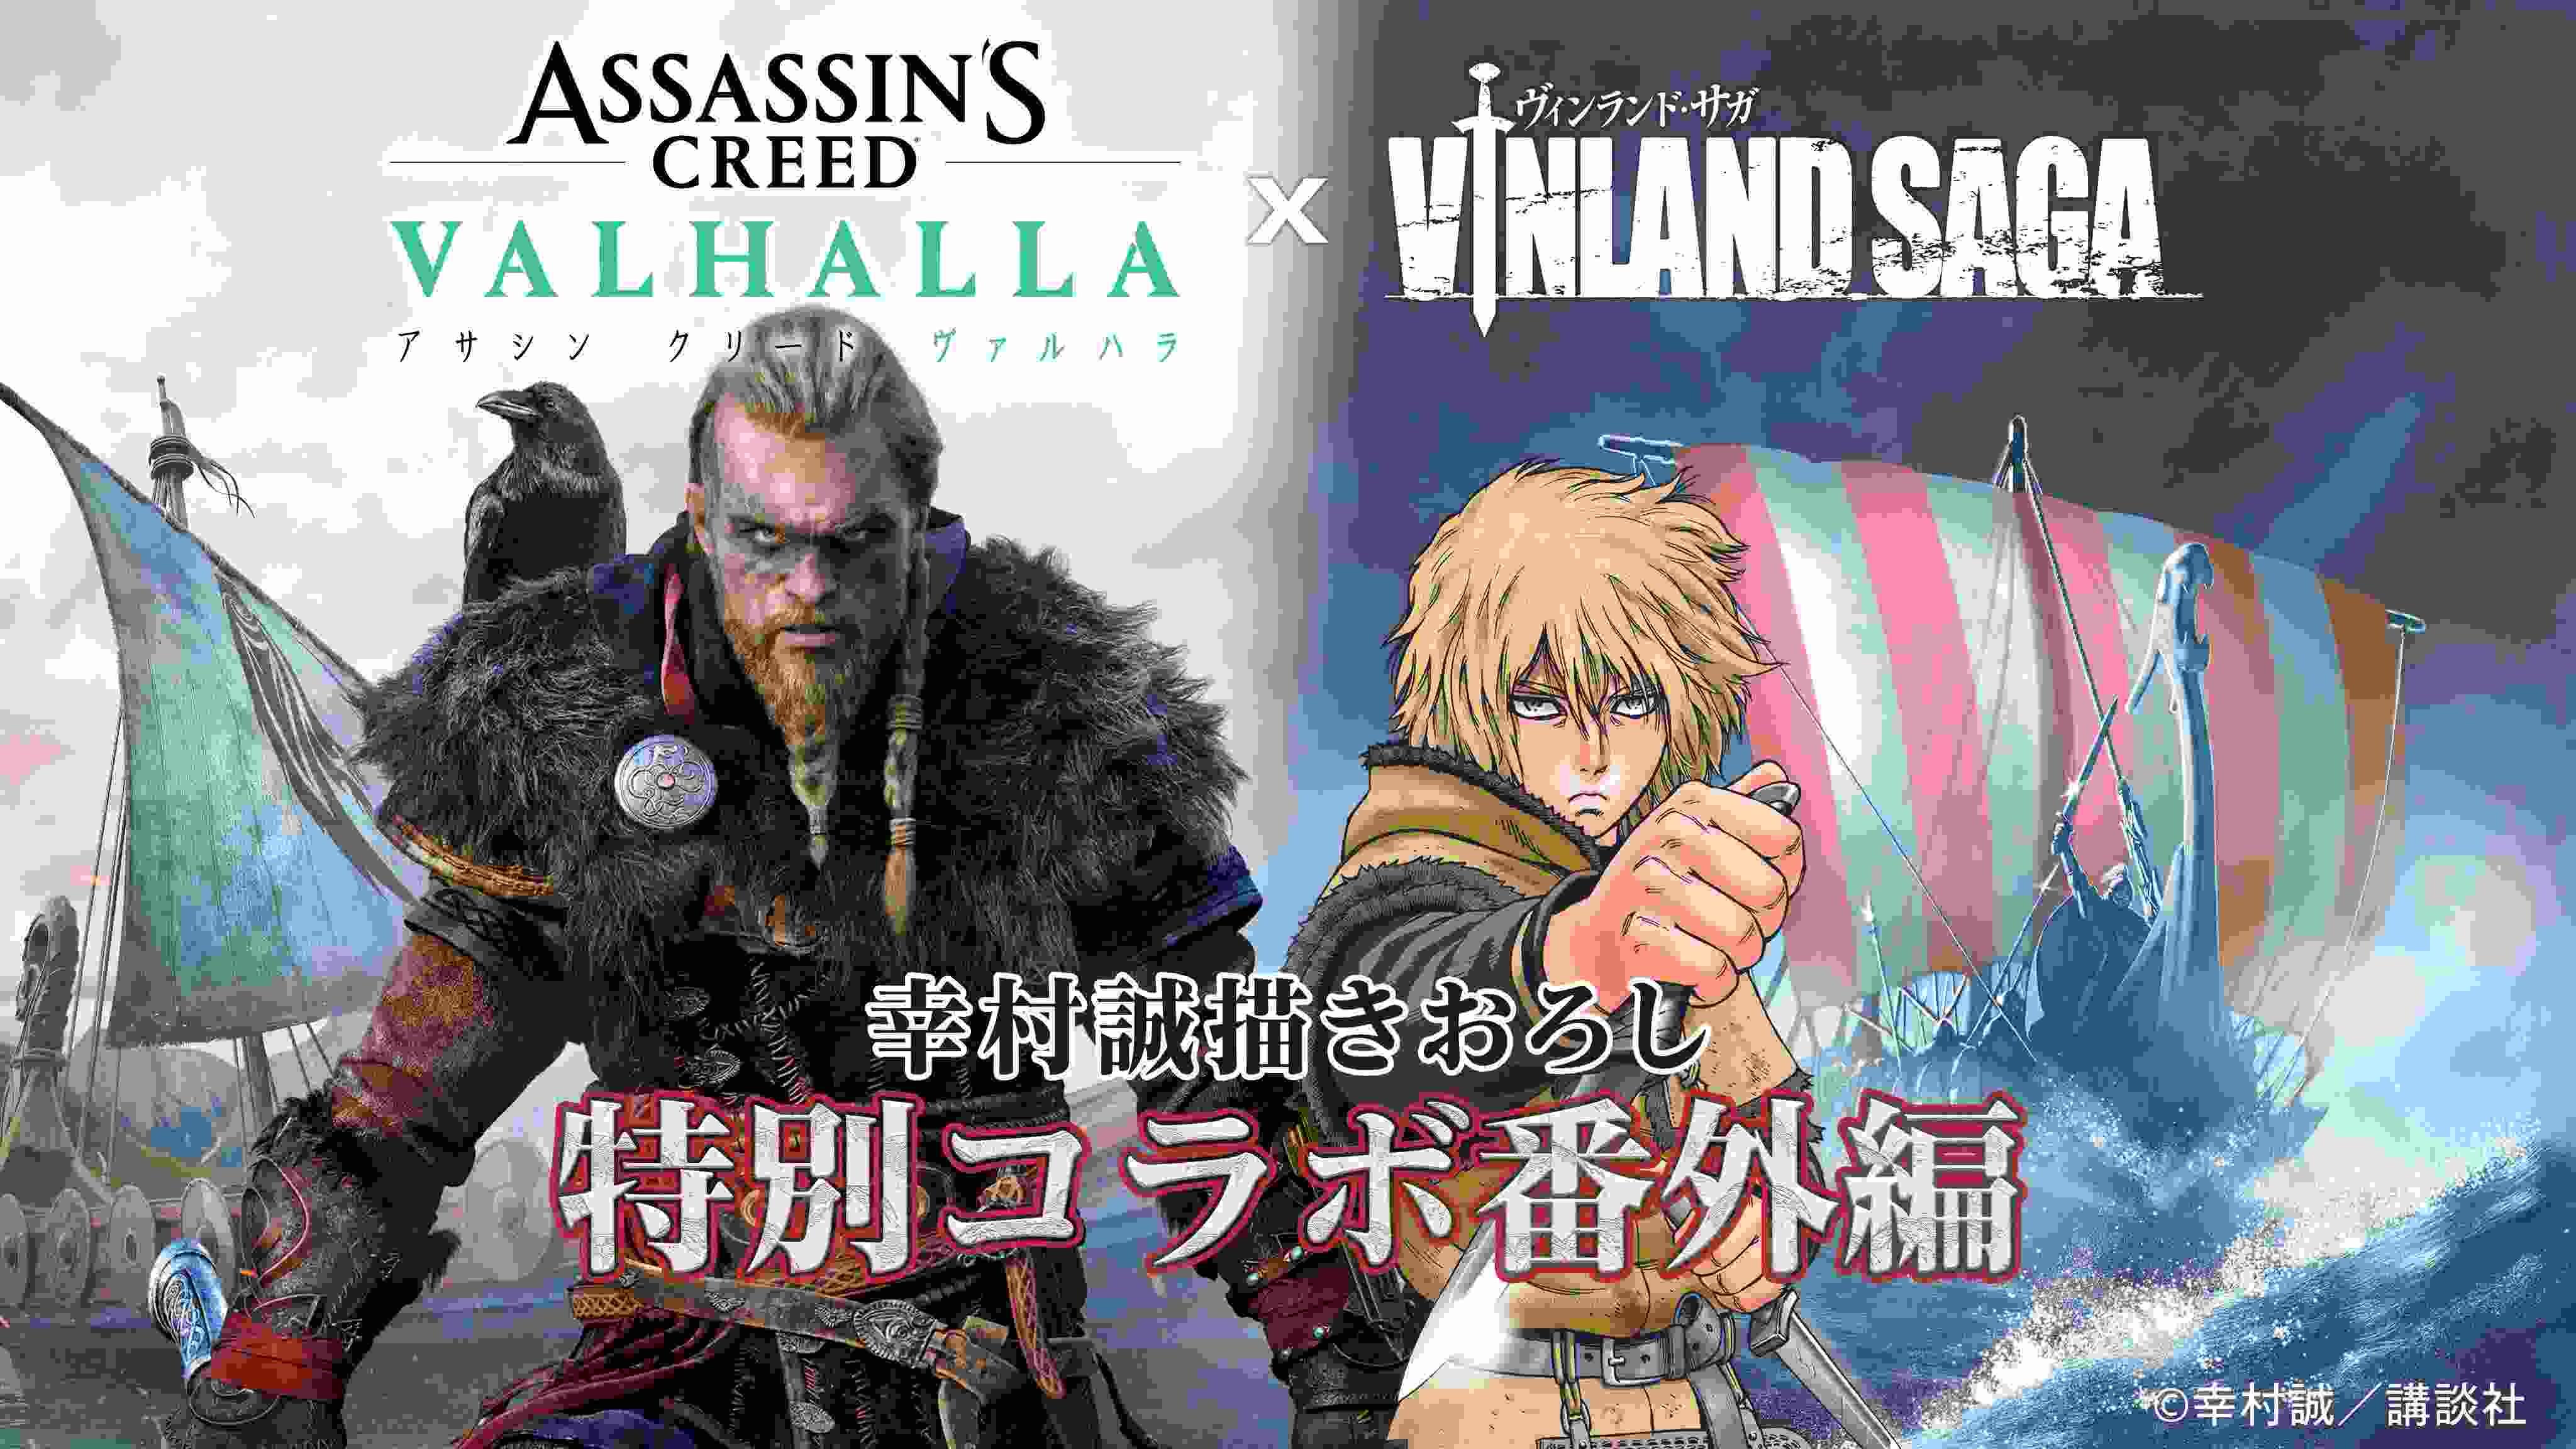 assassin's creed valhalla vinland saga